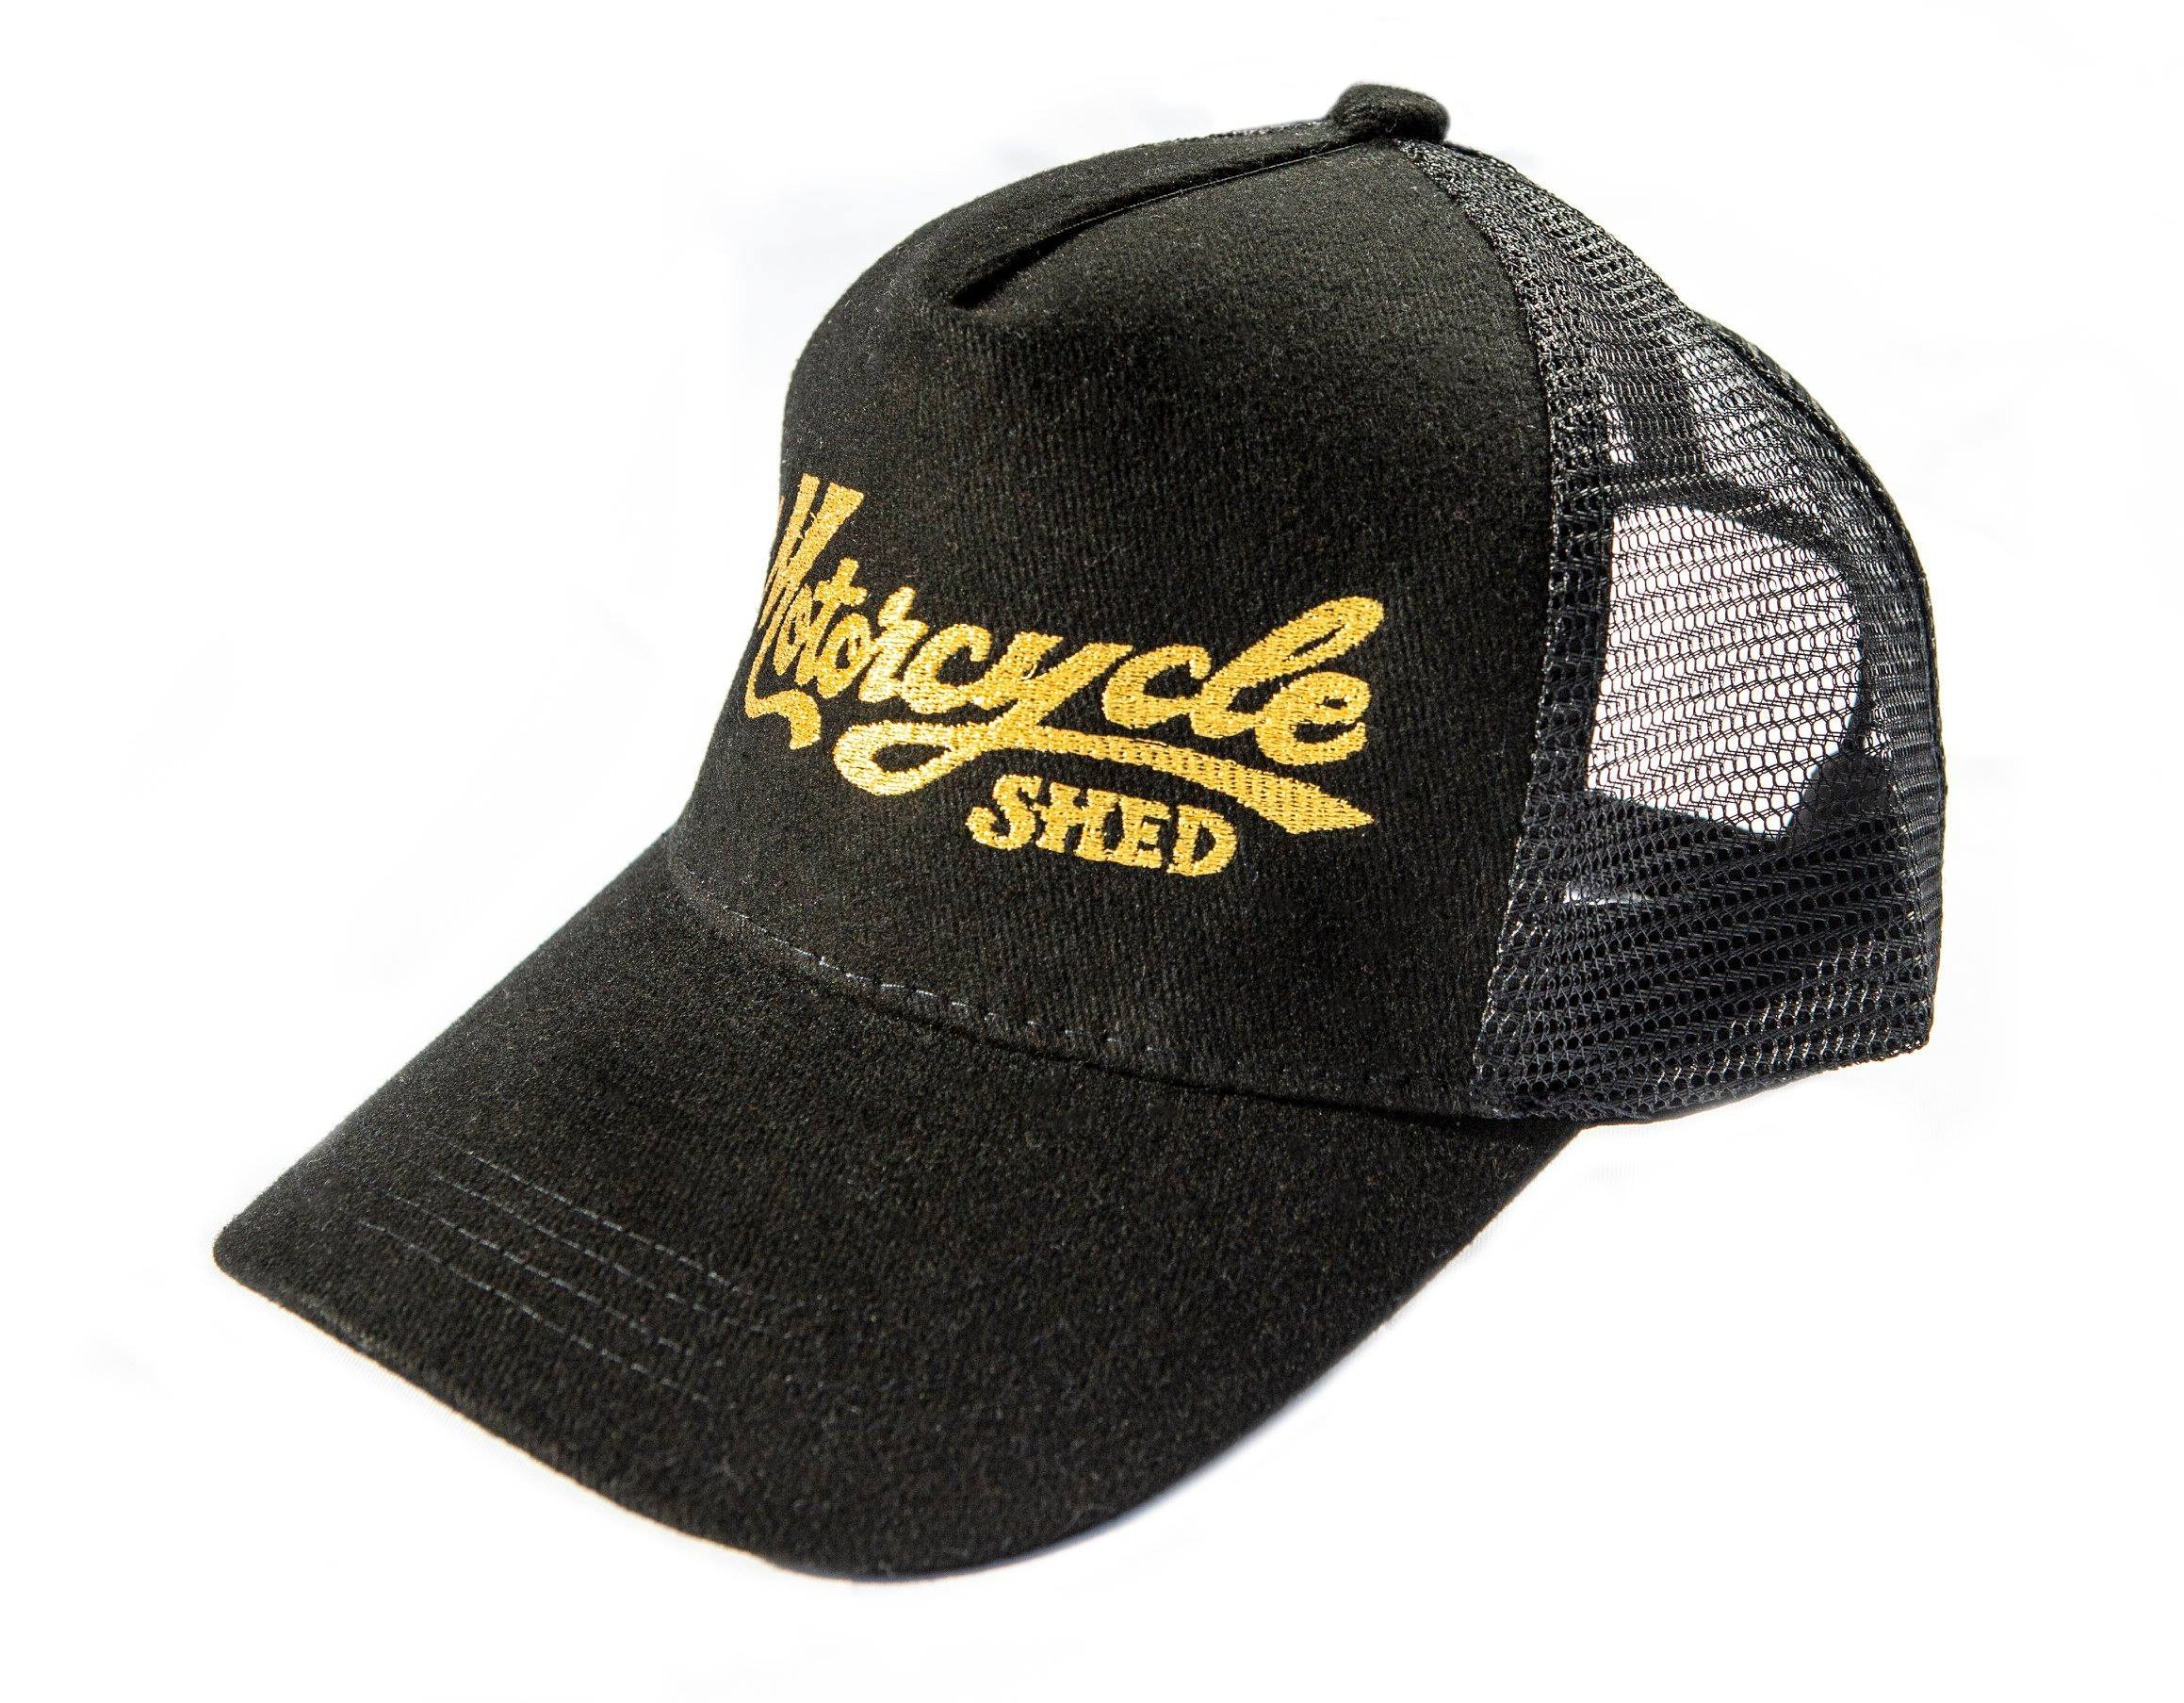 Motorcycle Shed Peak Cap - Mesh Back